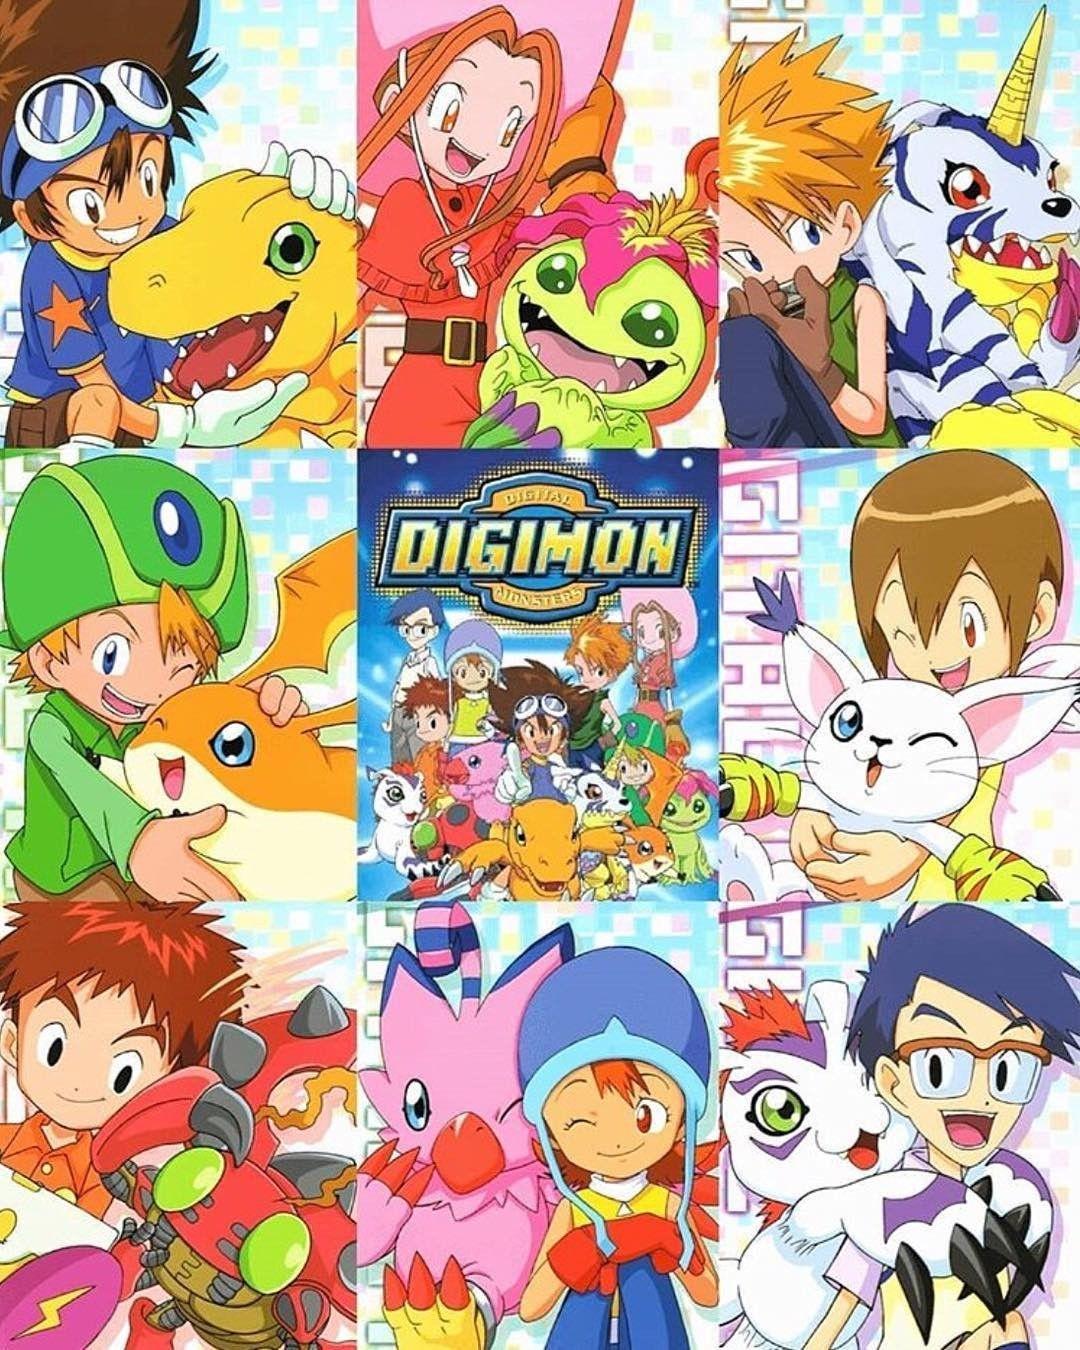 Original Digidestined Digimon Digital Monsters Anime Digimon Wallpaper